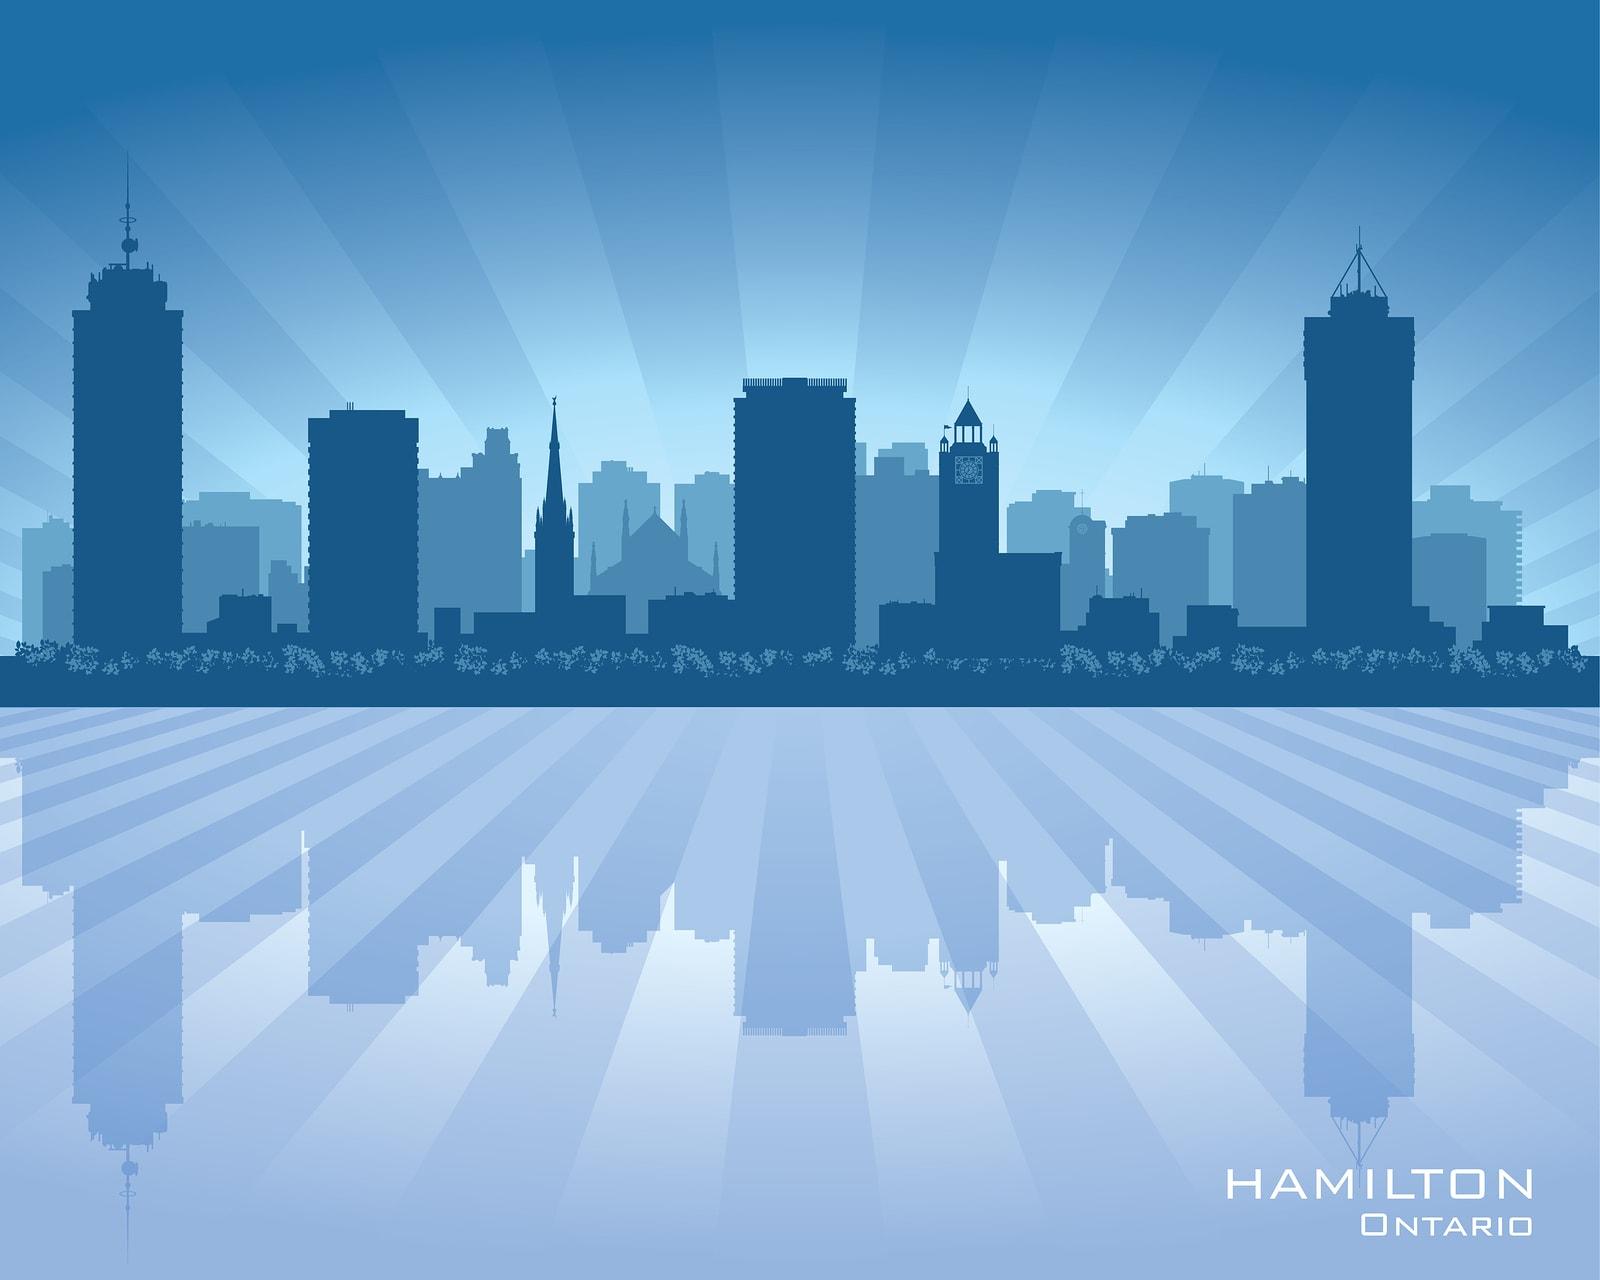 Hamilton Desktop wallpaper